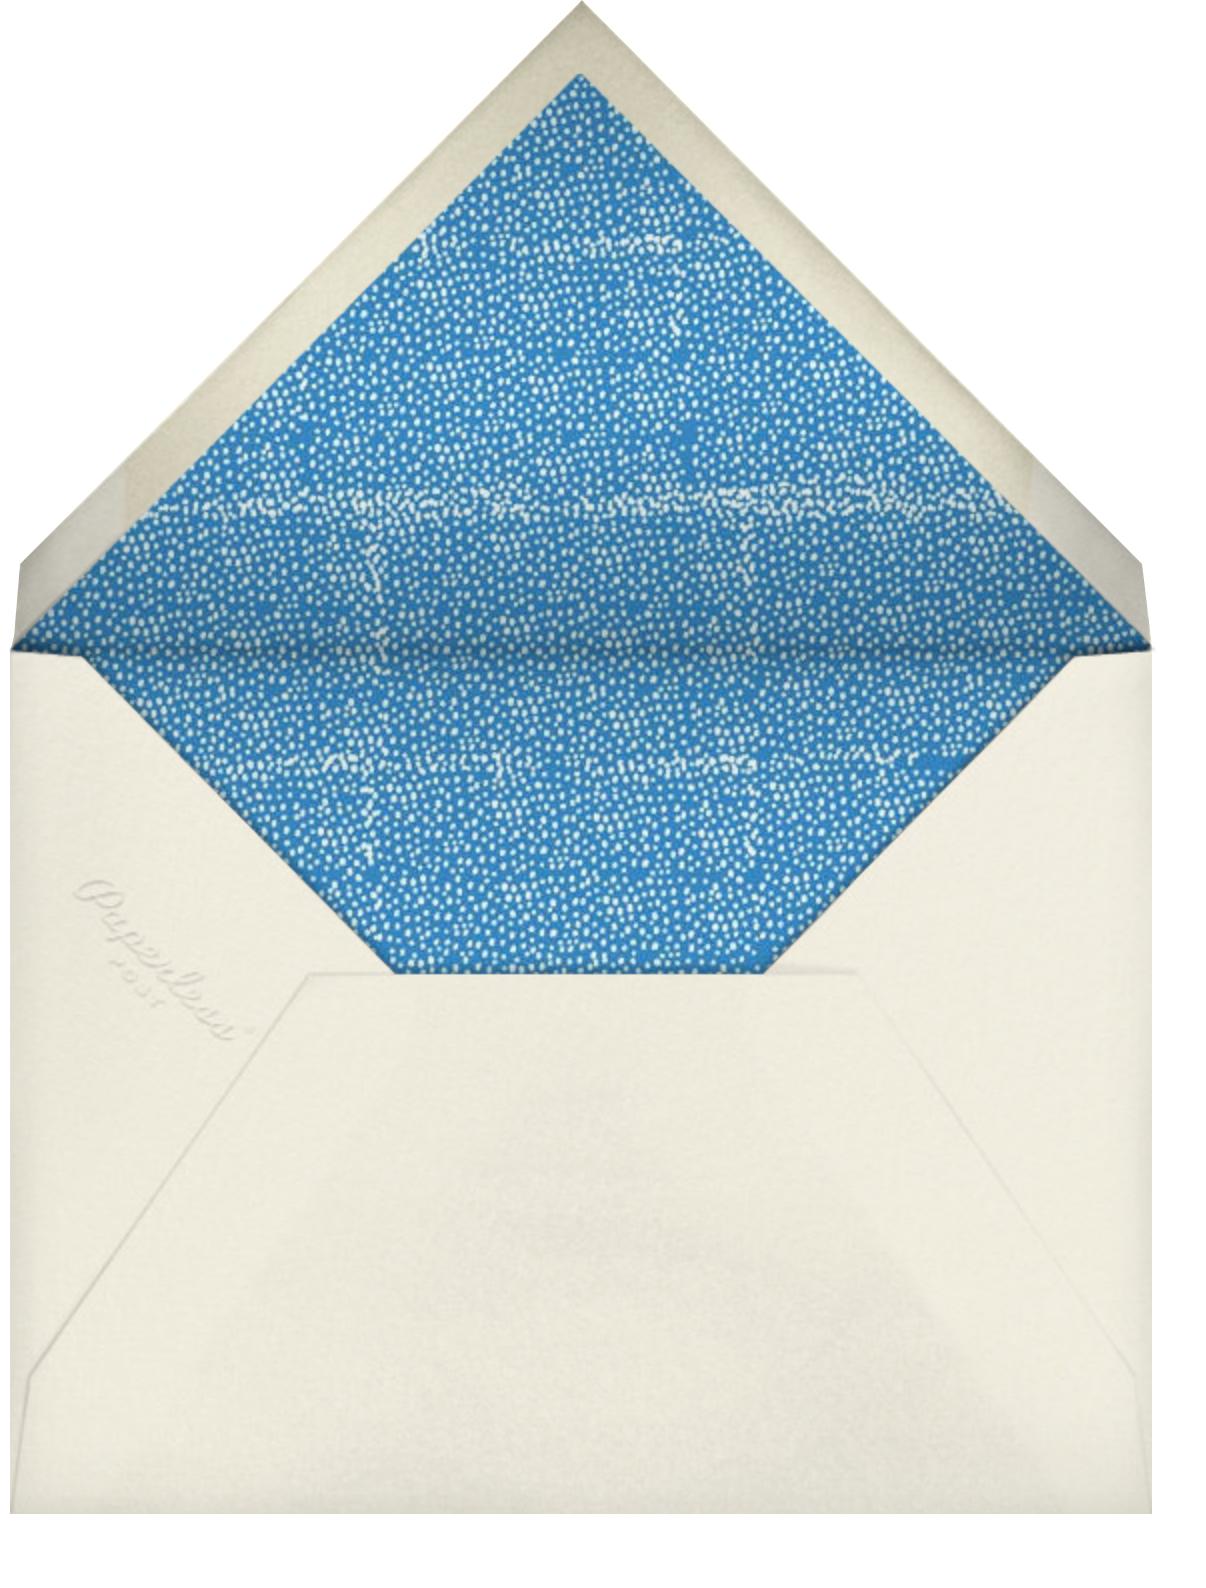 Ballot Box - Mr. Boddington's Studio - Political action - envelope back